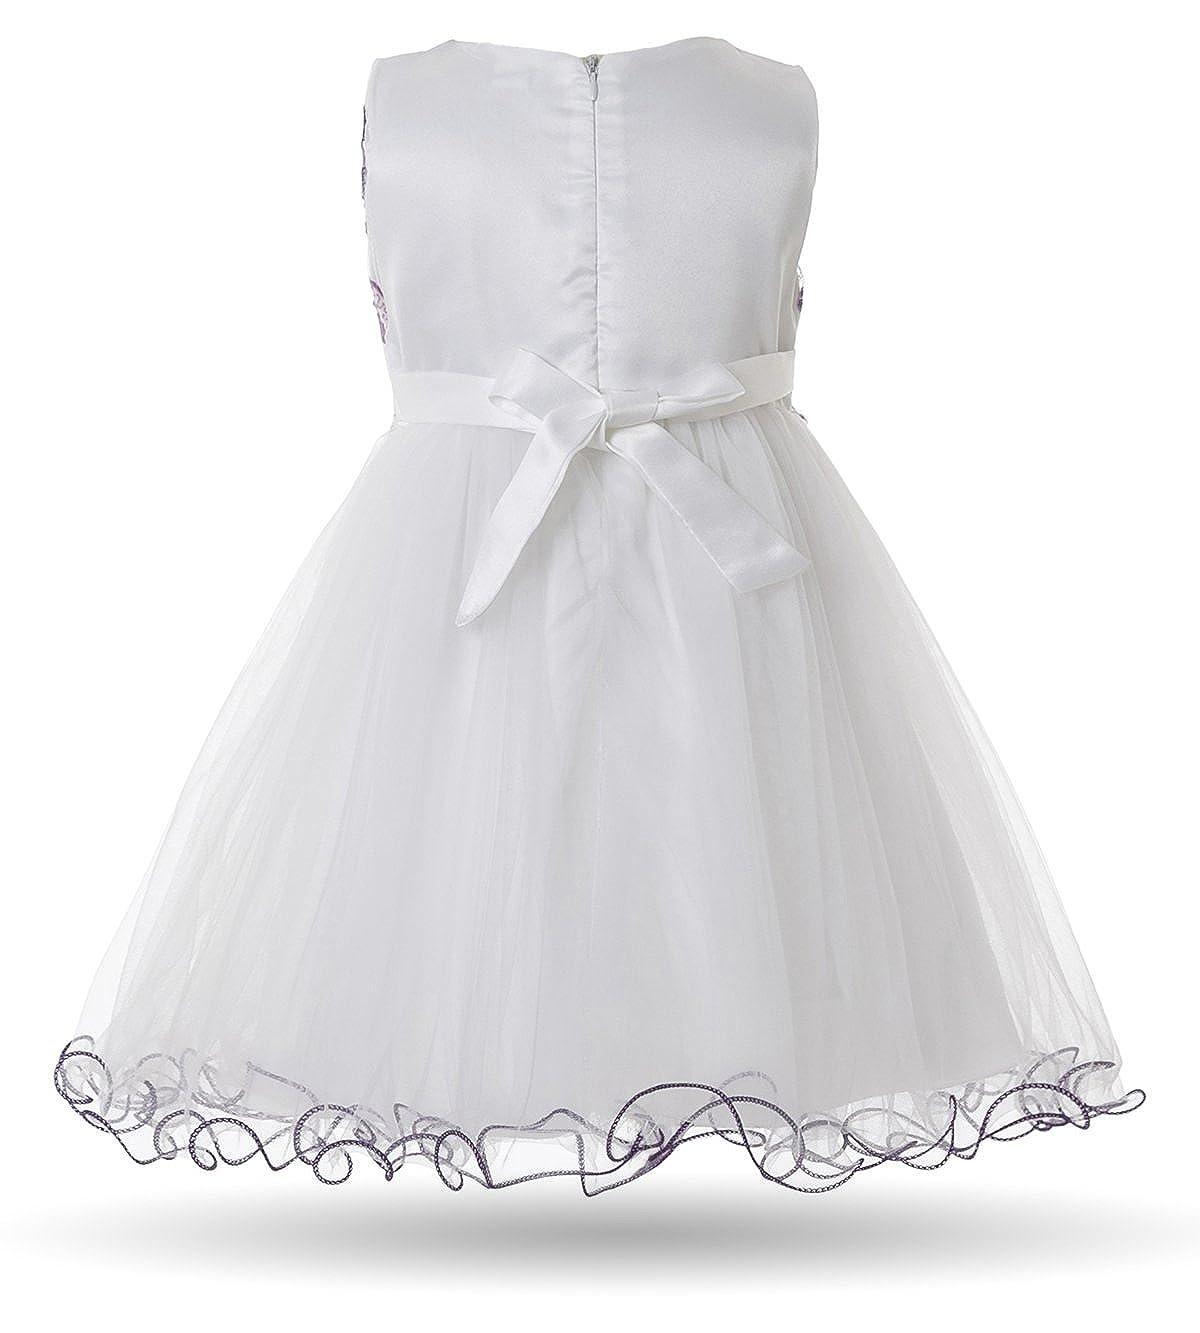 4f3cc3d52 CIELARKO Baby Girl Dress Infant Flower Lace Wedding Party Dresses ...